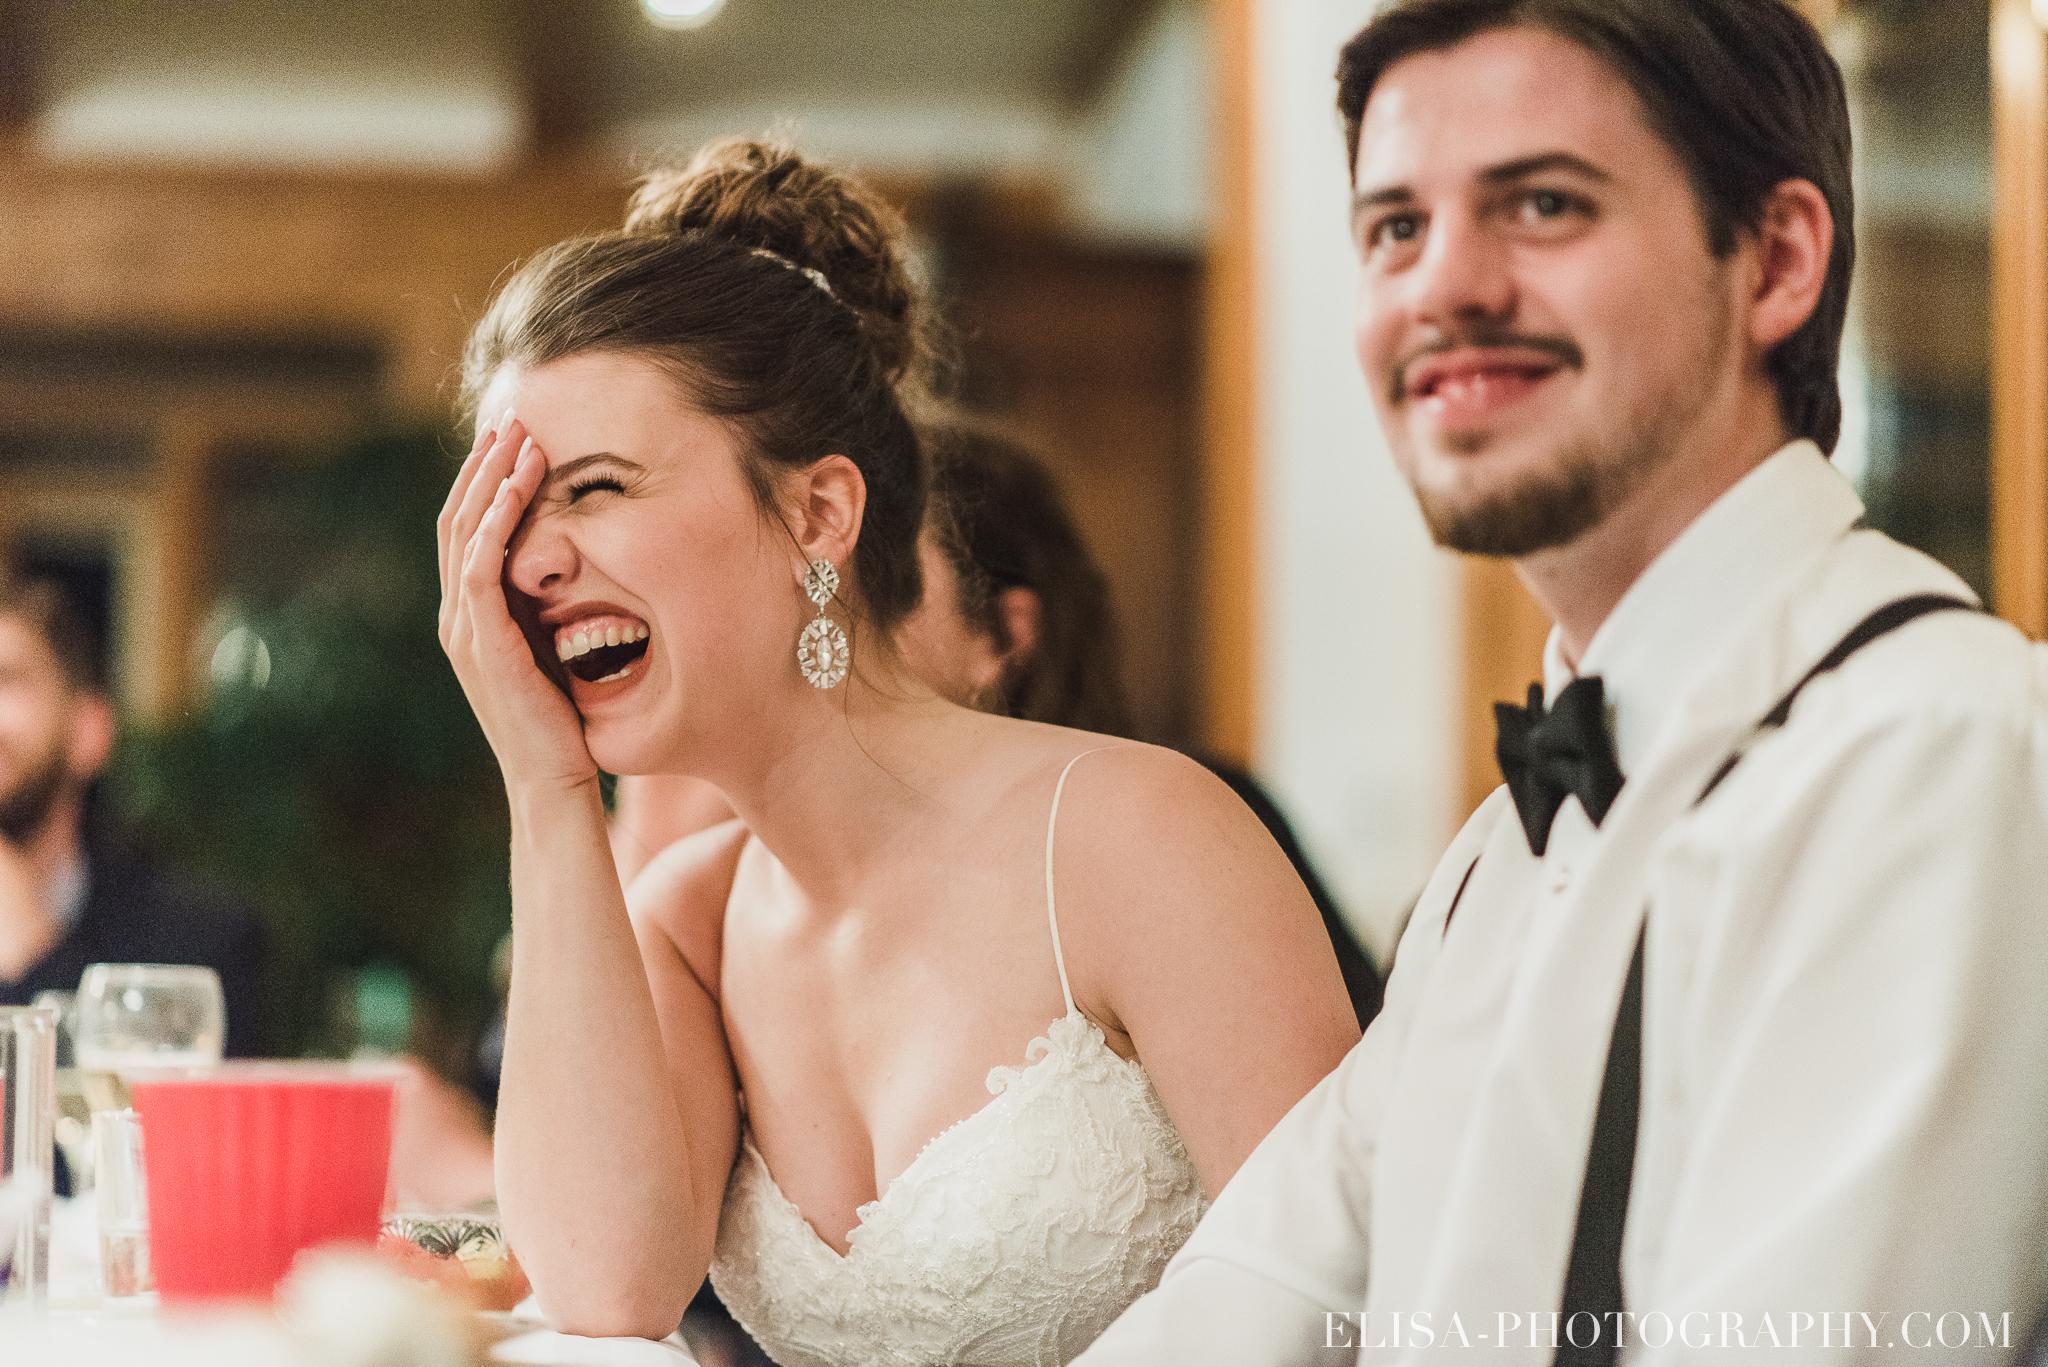 photo mariage a la montagne domaine tomali maniatin reception lifestyle 7250 - Mariage à la montagne au domaine Tomali-Maniatyn